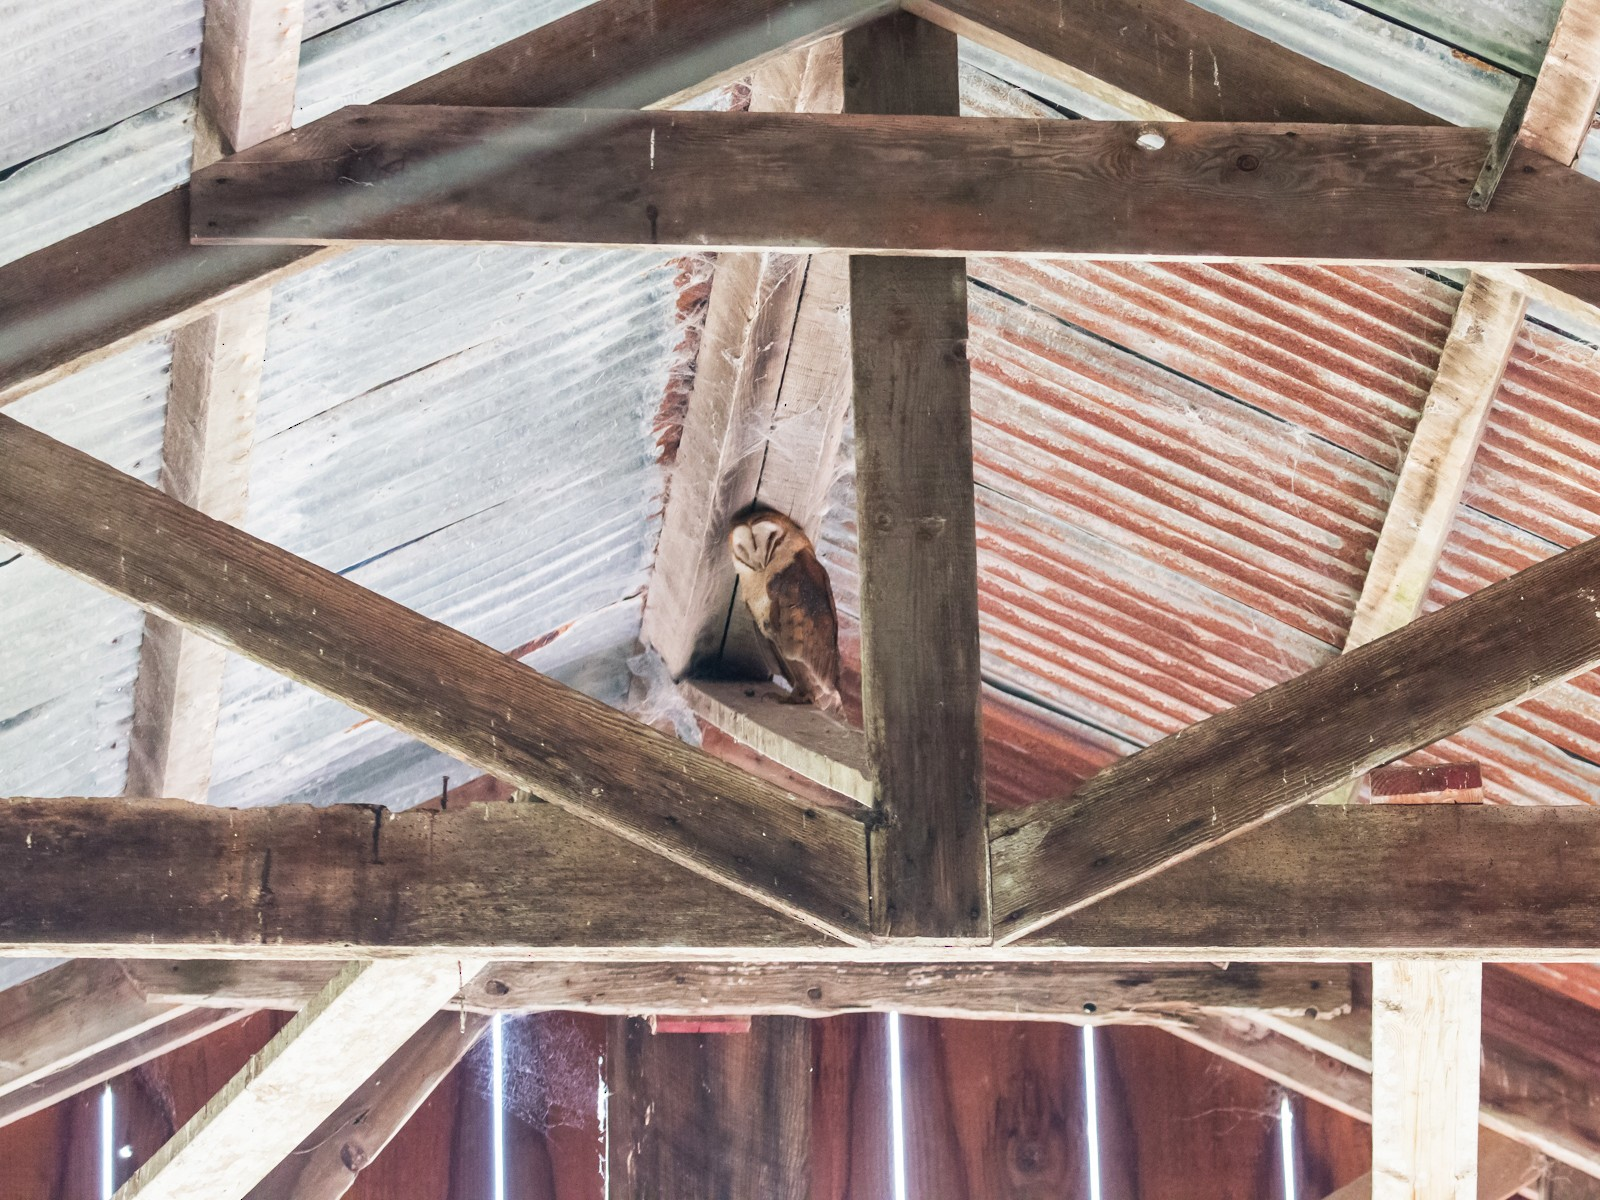 Barn Owl - Carolyn Belknap